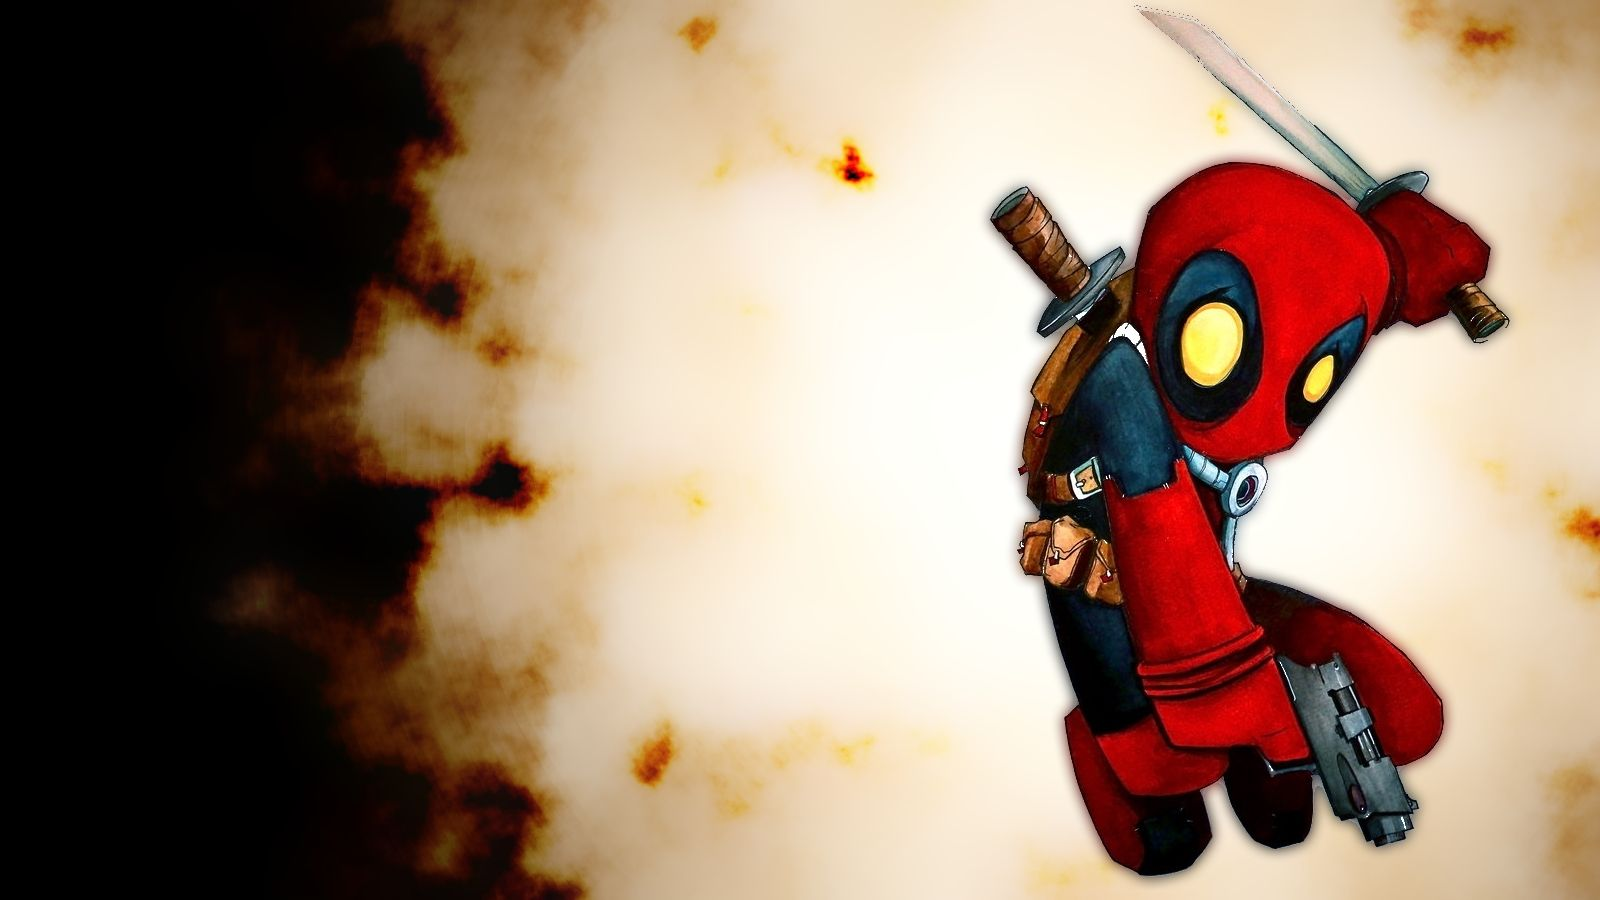 1000 Ideas About Deadpool Hd Wallpaper On Pinterest: Cute Chibi Deadpool Desktop Wallpaper